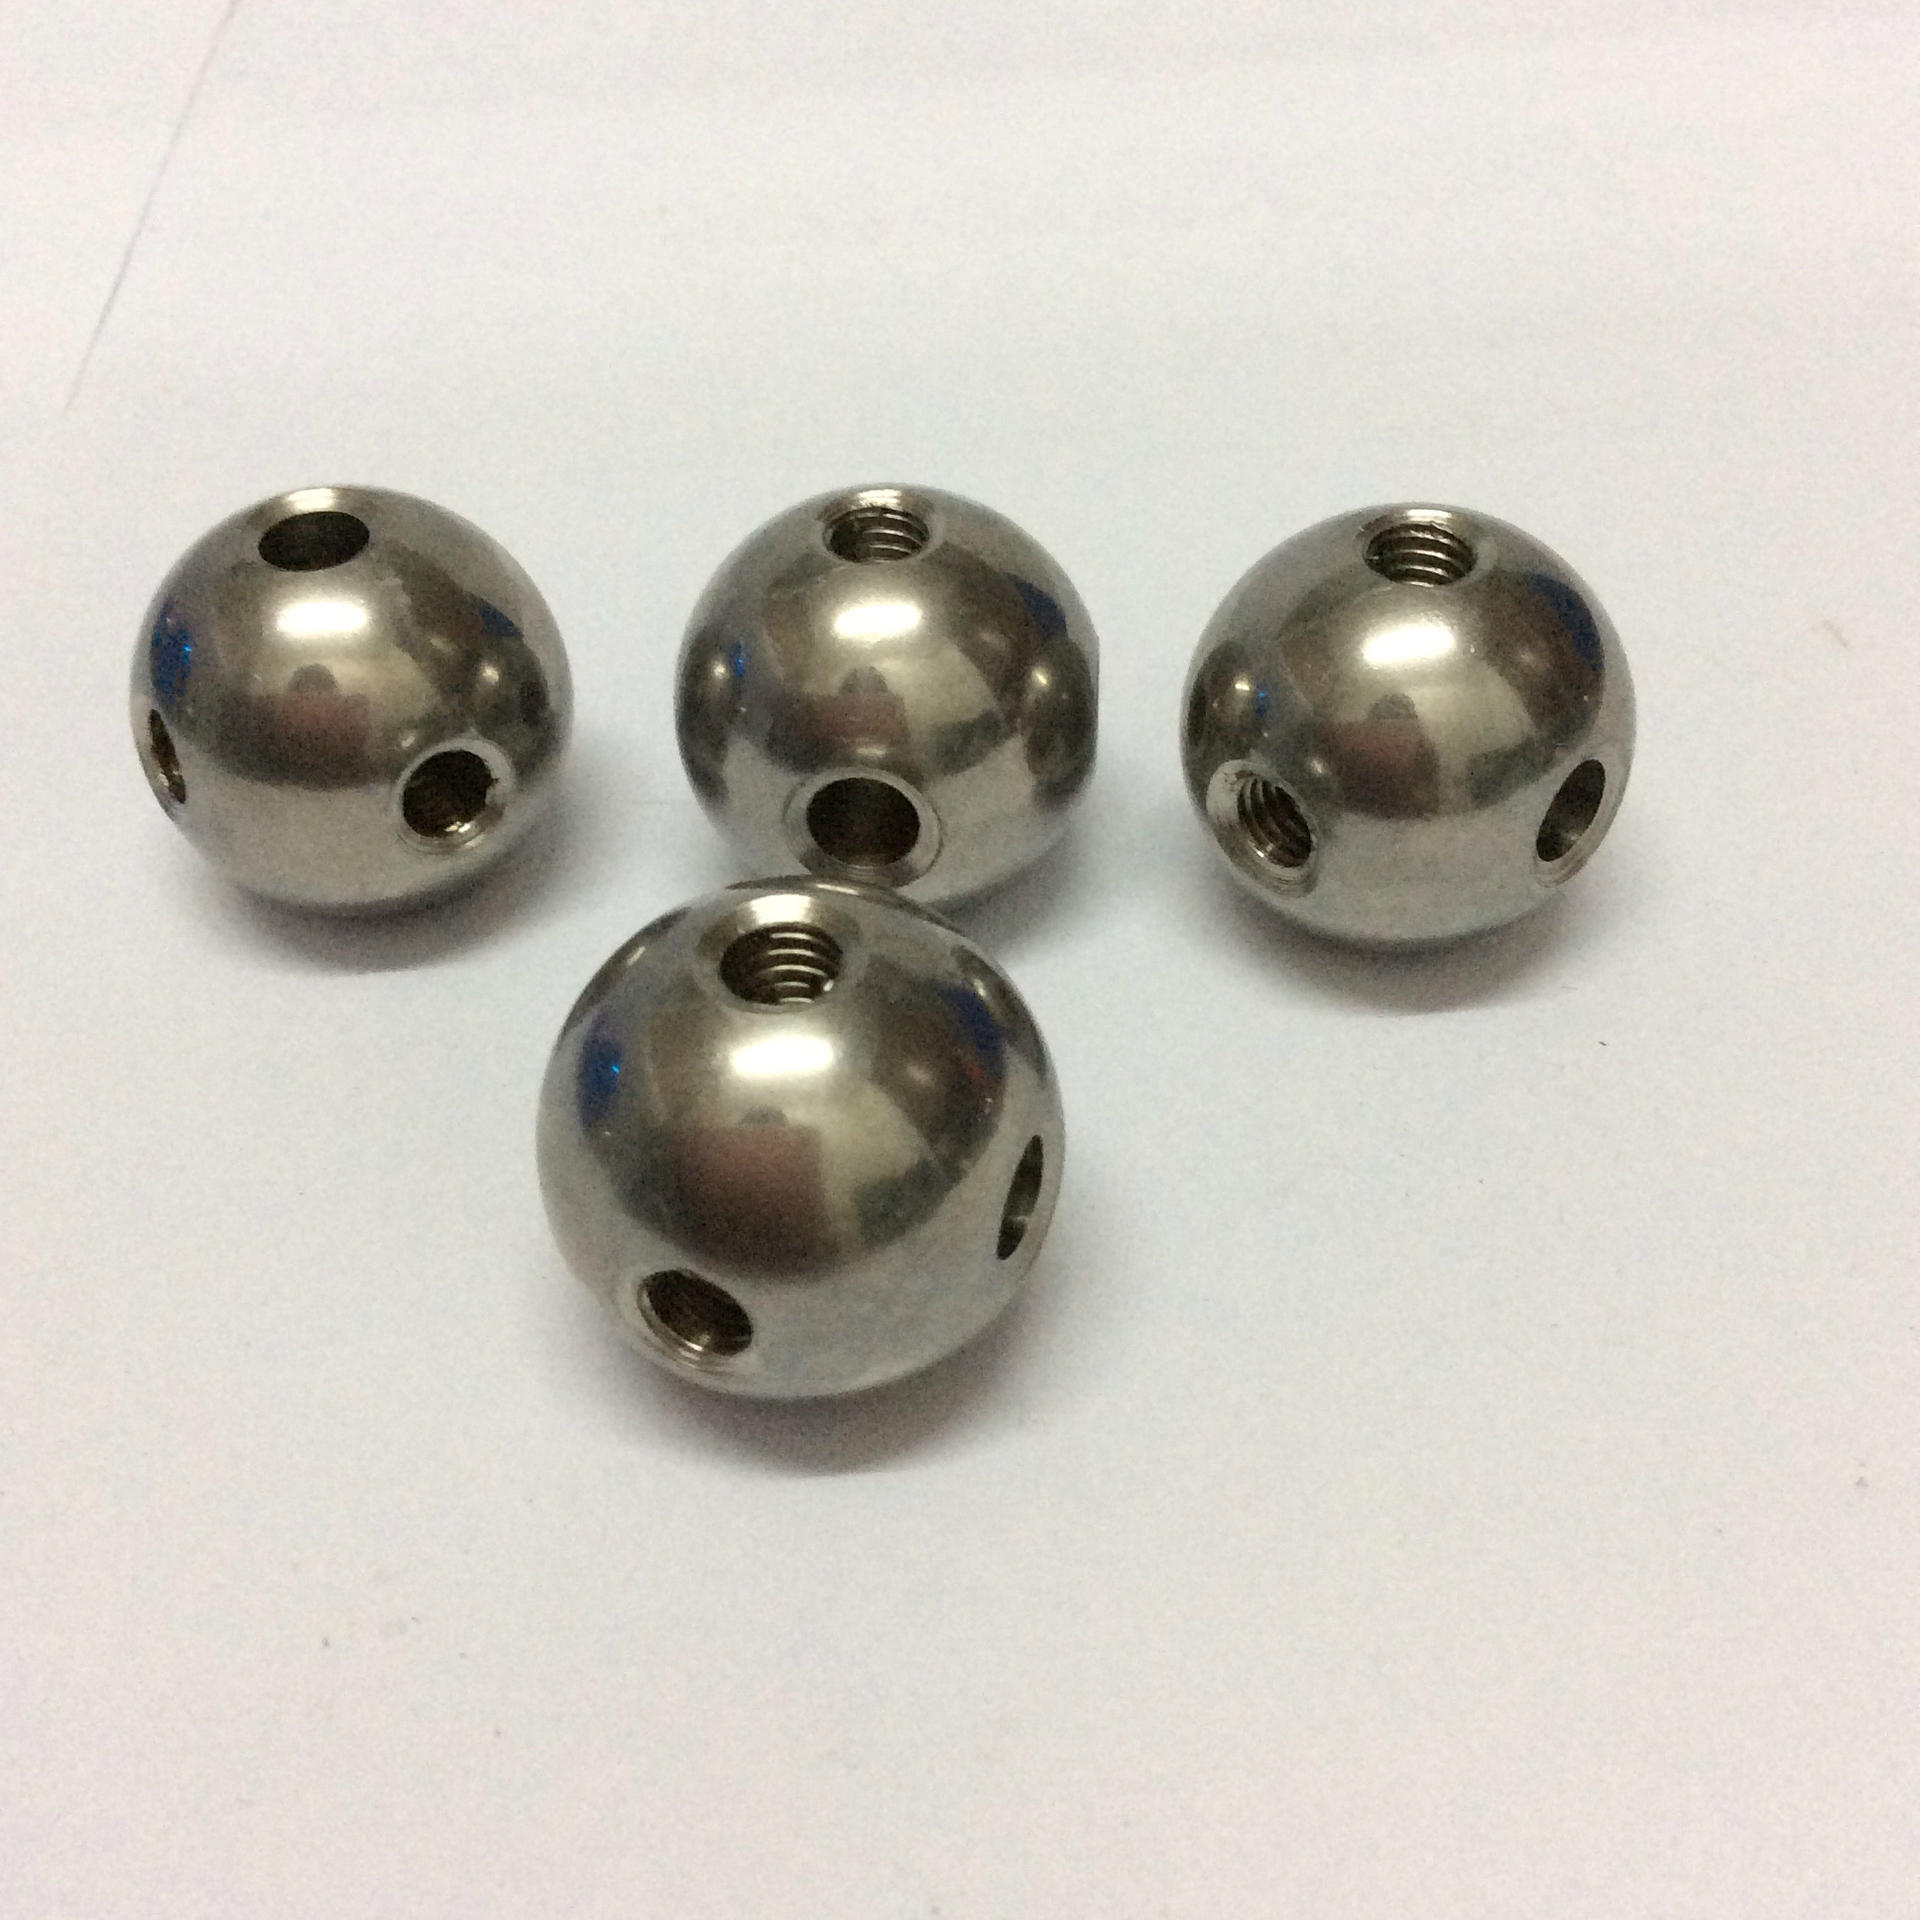 metal balls threaded